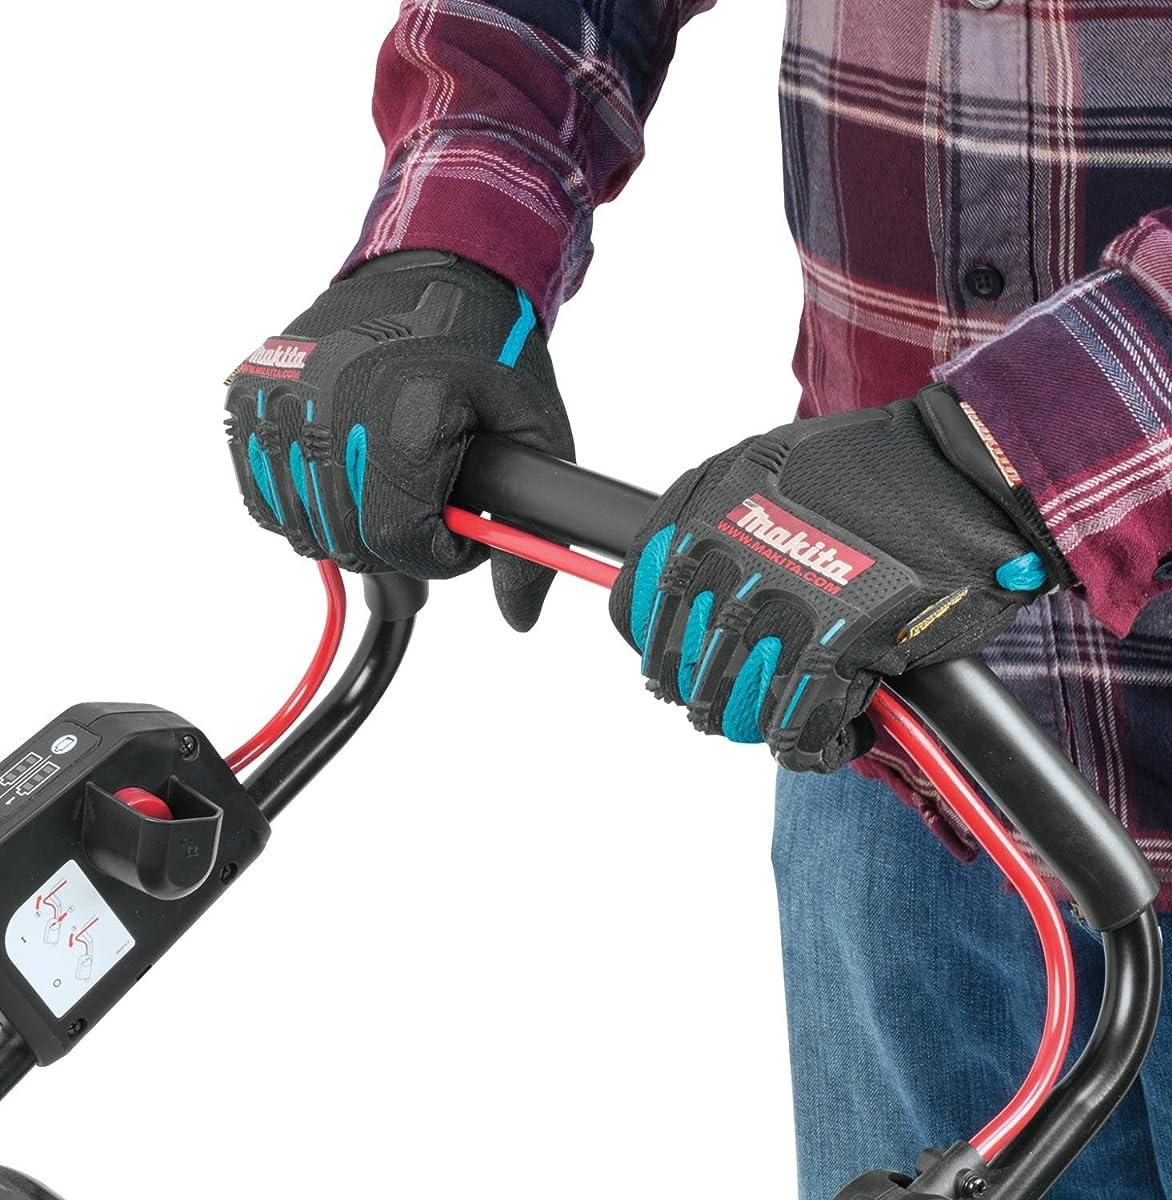 "Makita XML02Z 18V X2 (36V) LXT Lithium-Ion Cordless 17"" Lawn Mower, Tool Only"